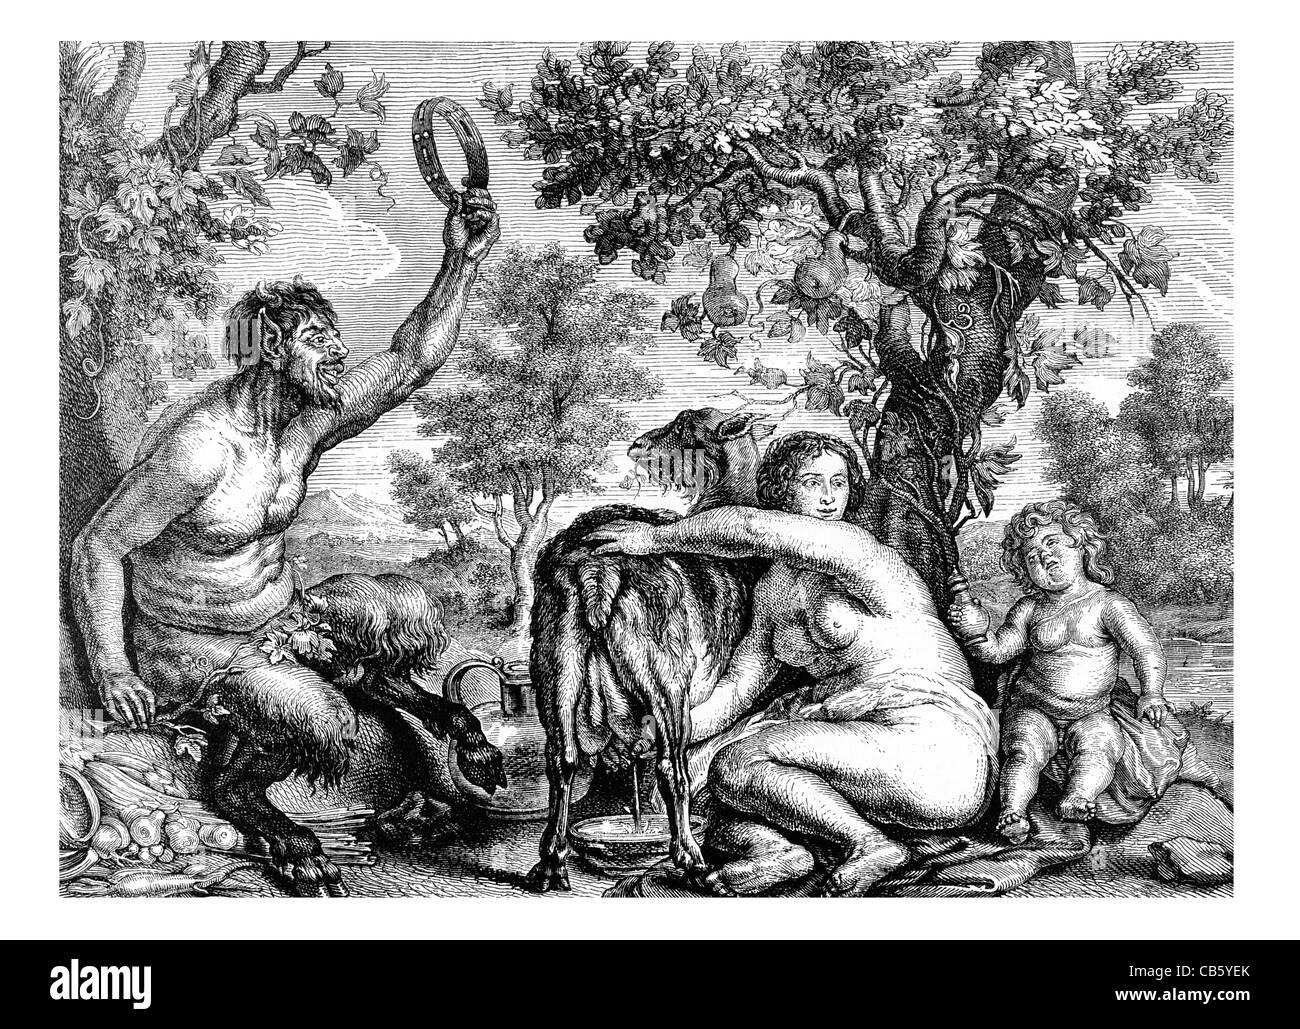 Jupiter and the Goat Jacob Jordaens Greek myth mythological beast fawn child man woman milking goat allegorical - Stock Image